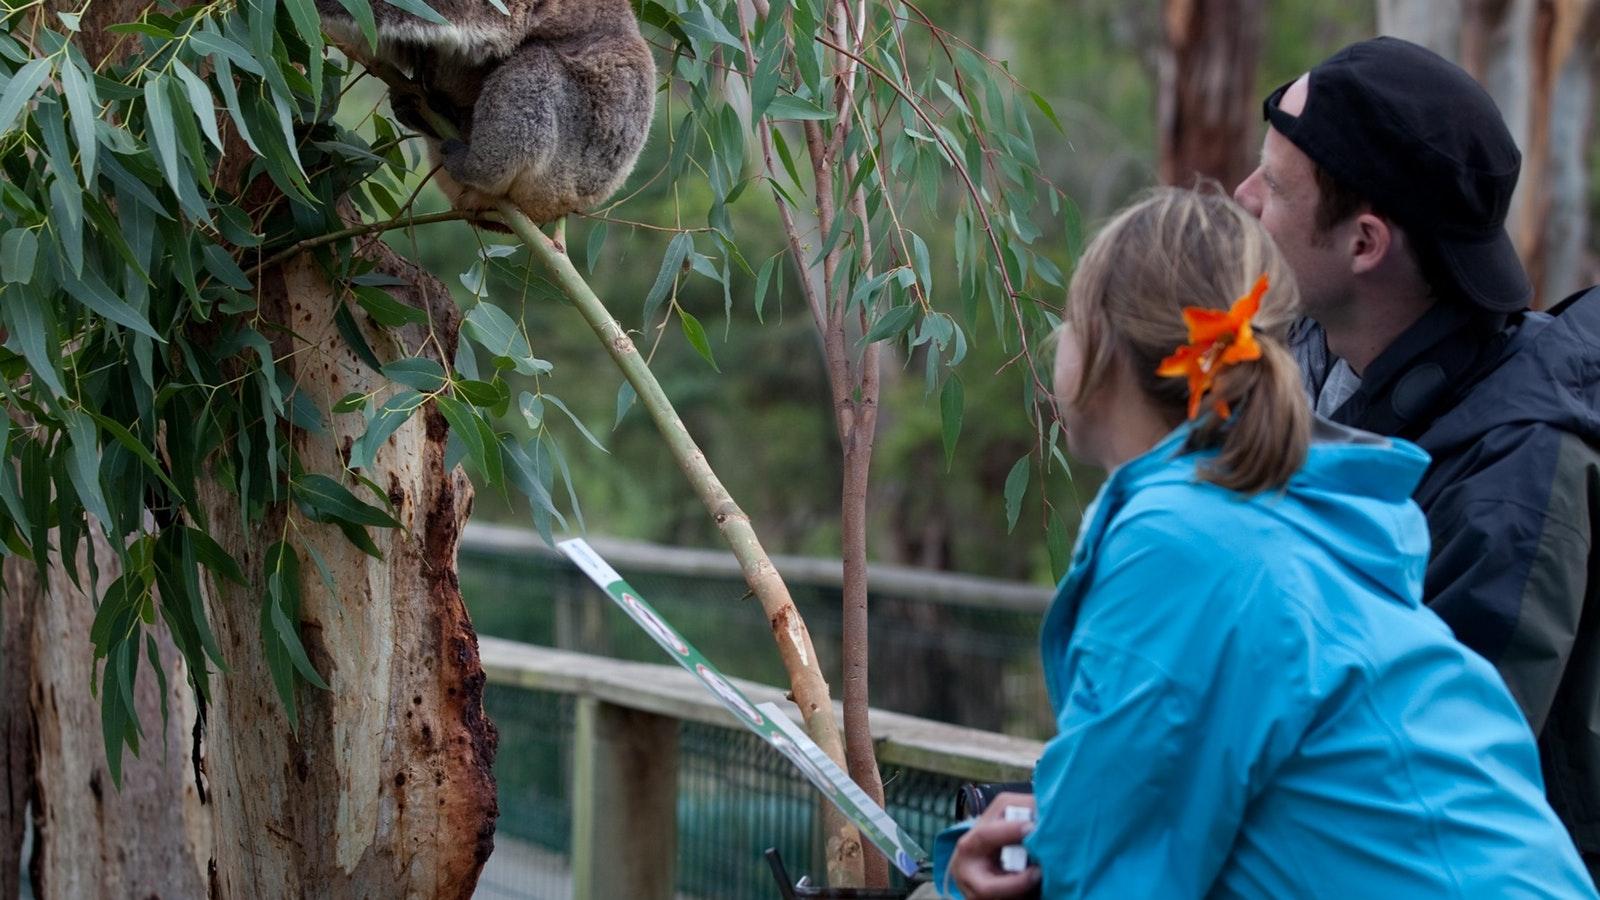 Viewing Koalas at the Koala Conservation Centre